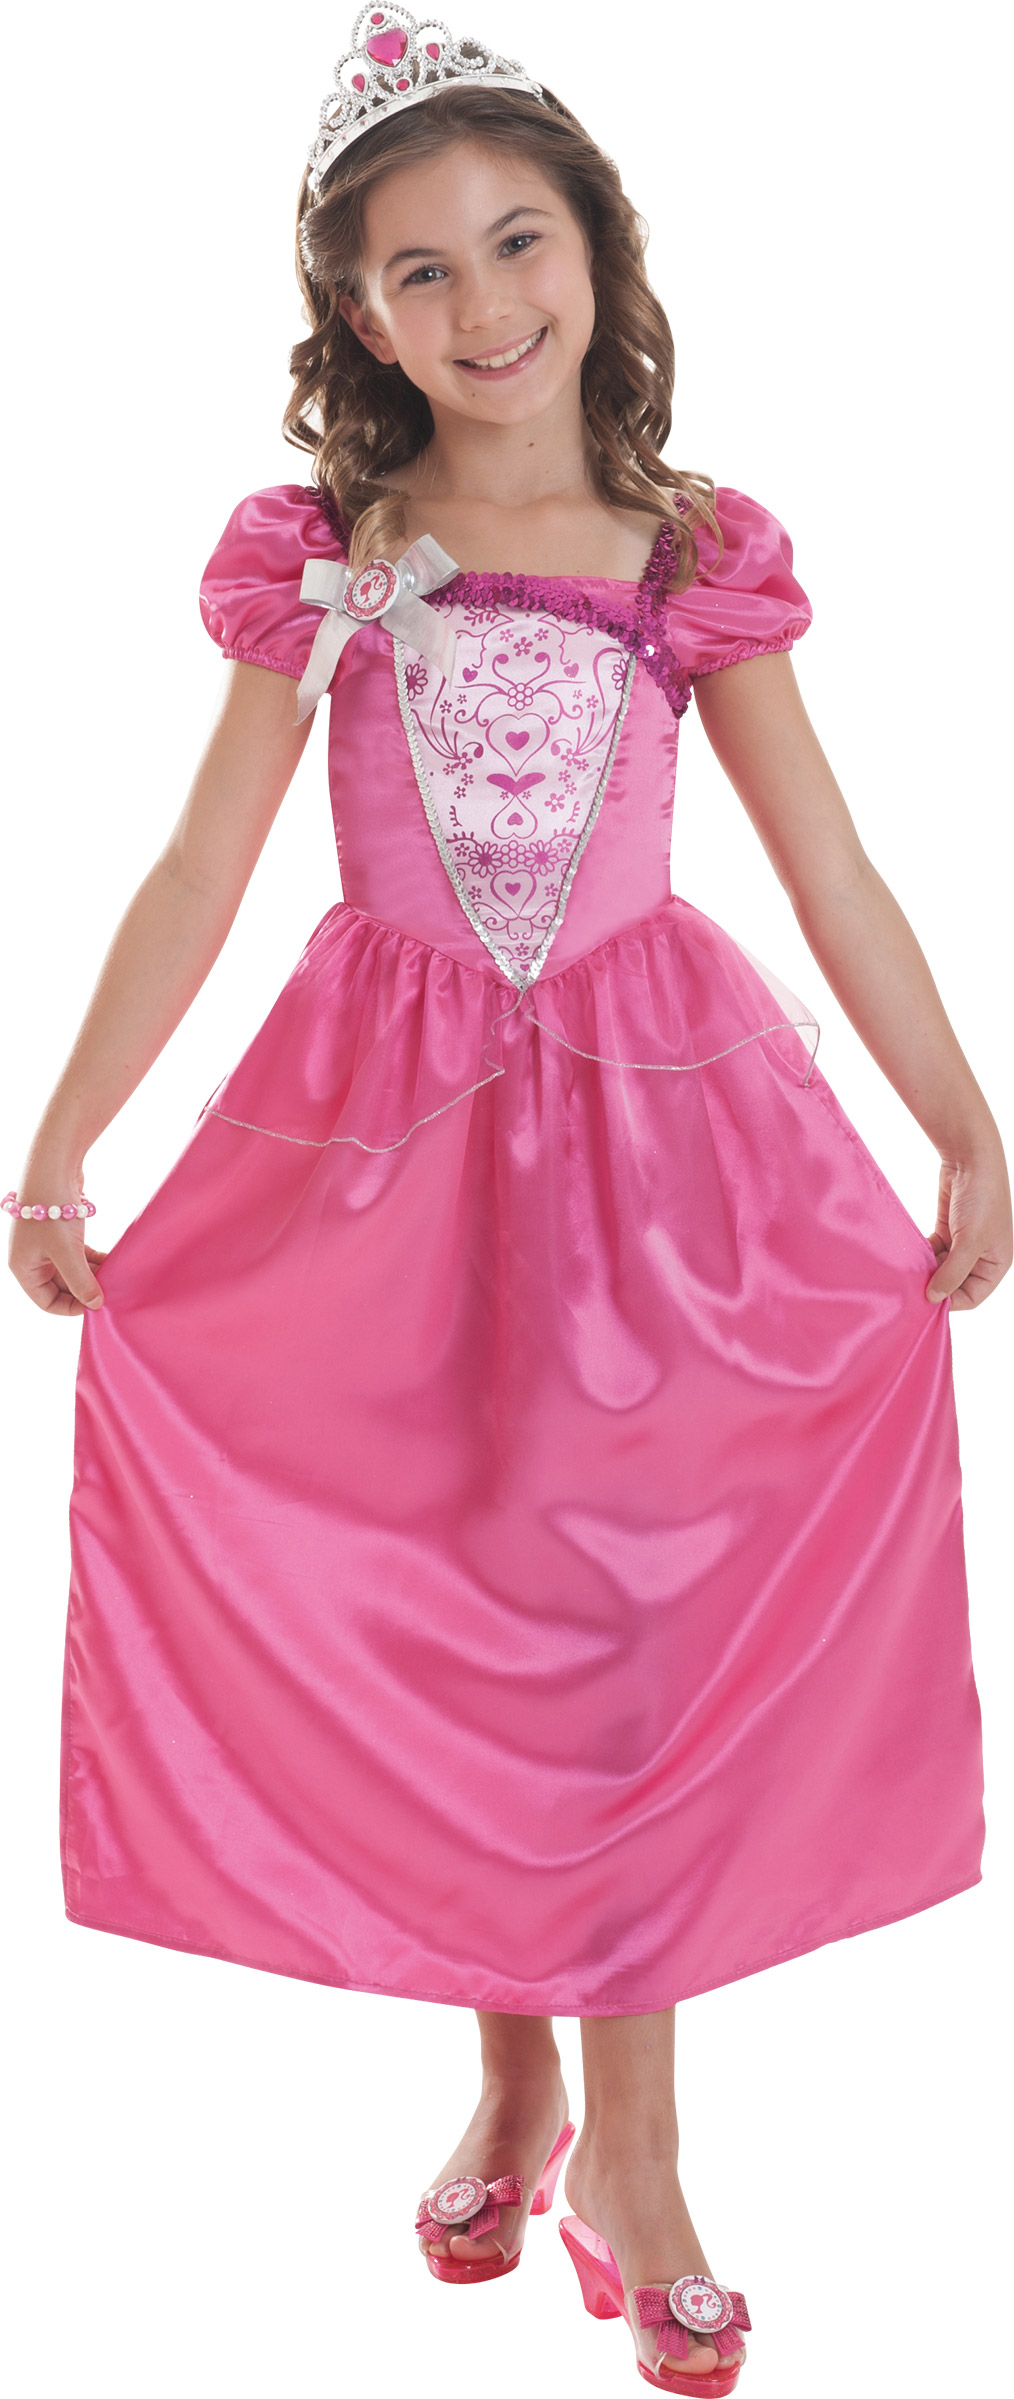 Costume barbie principessa bambina costumi bambini e - Desanime de barbie princesse ...